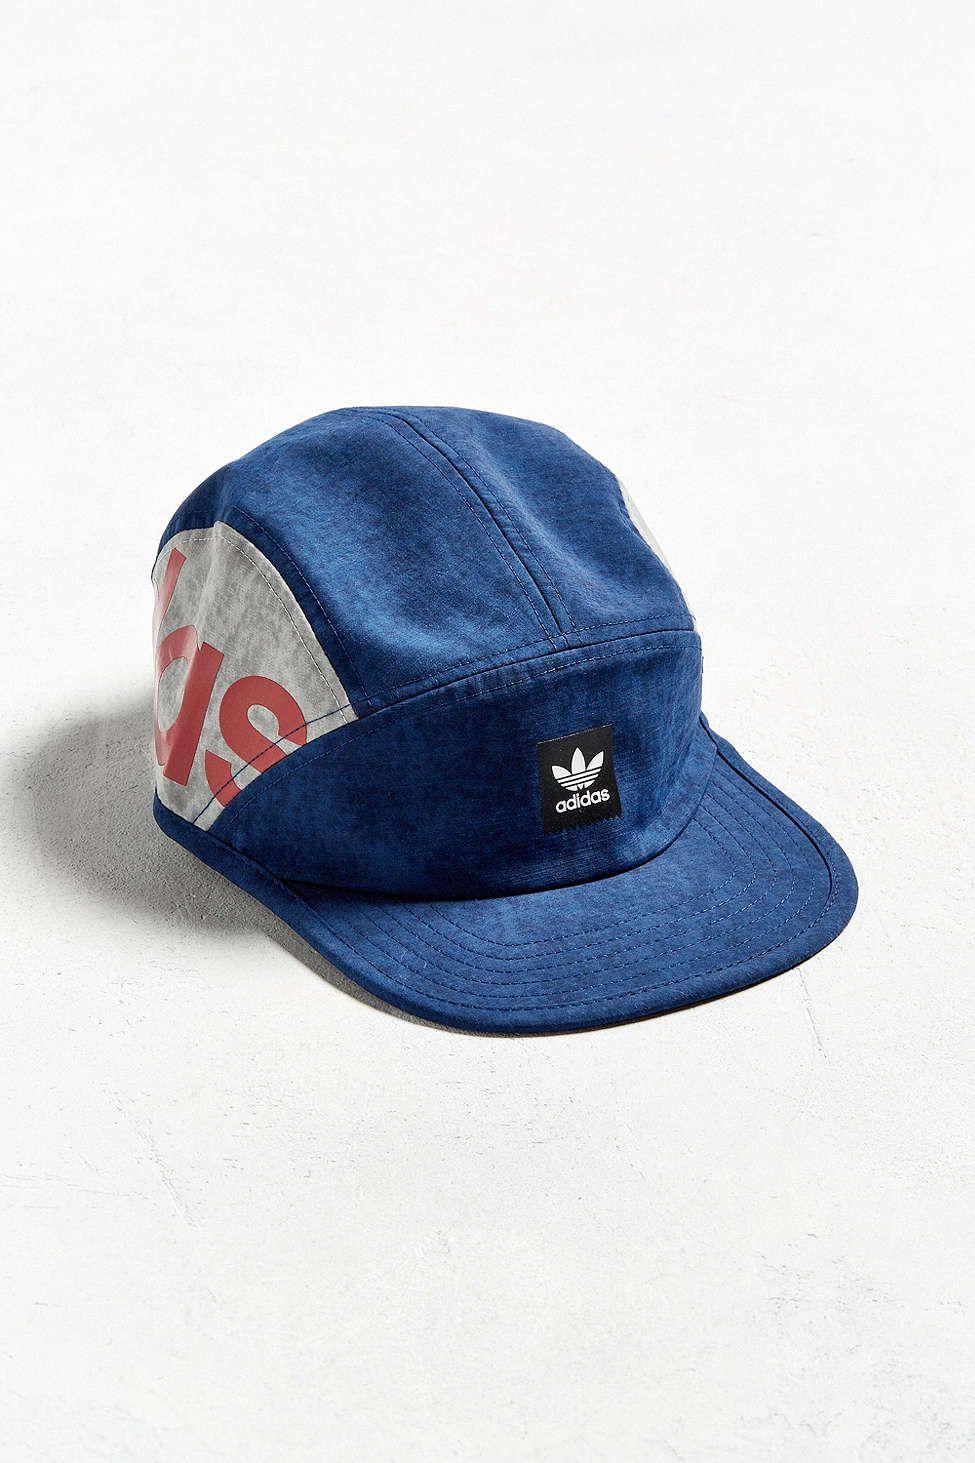 Adidas Skateboarding Gonz Pack Words 5 Panel Hat Hats For Men 5 Panel Hat Hats